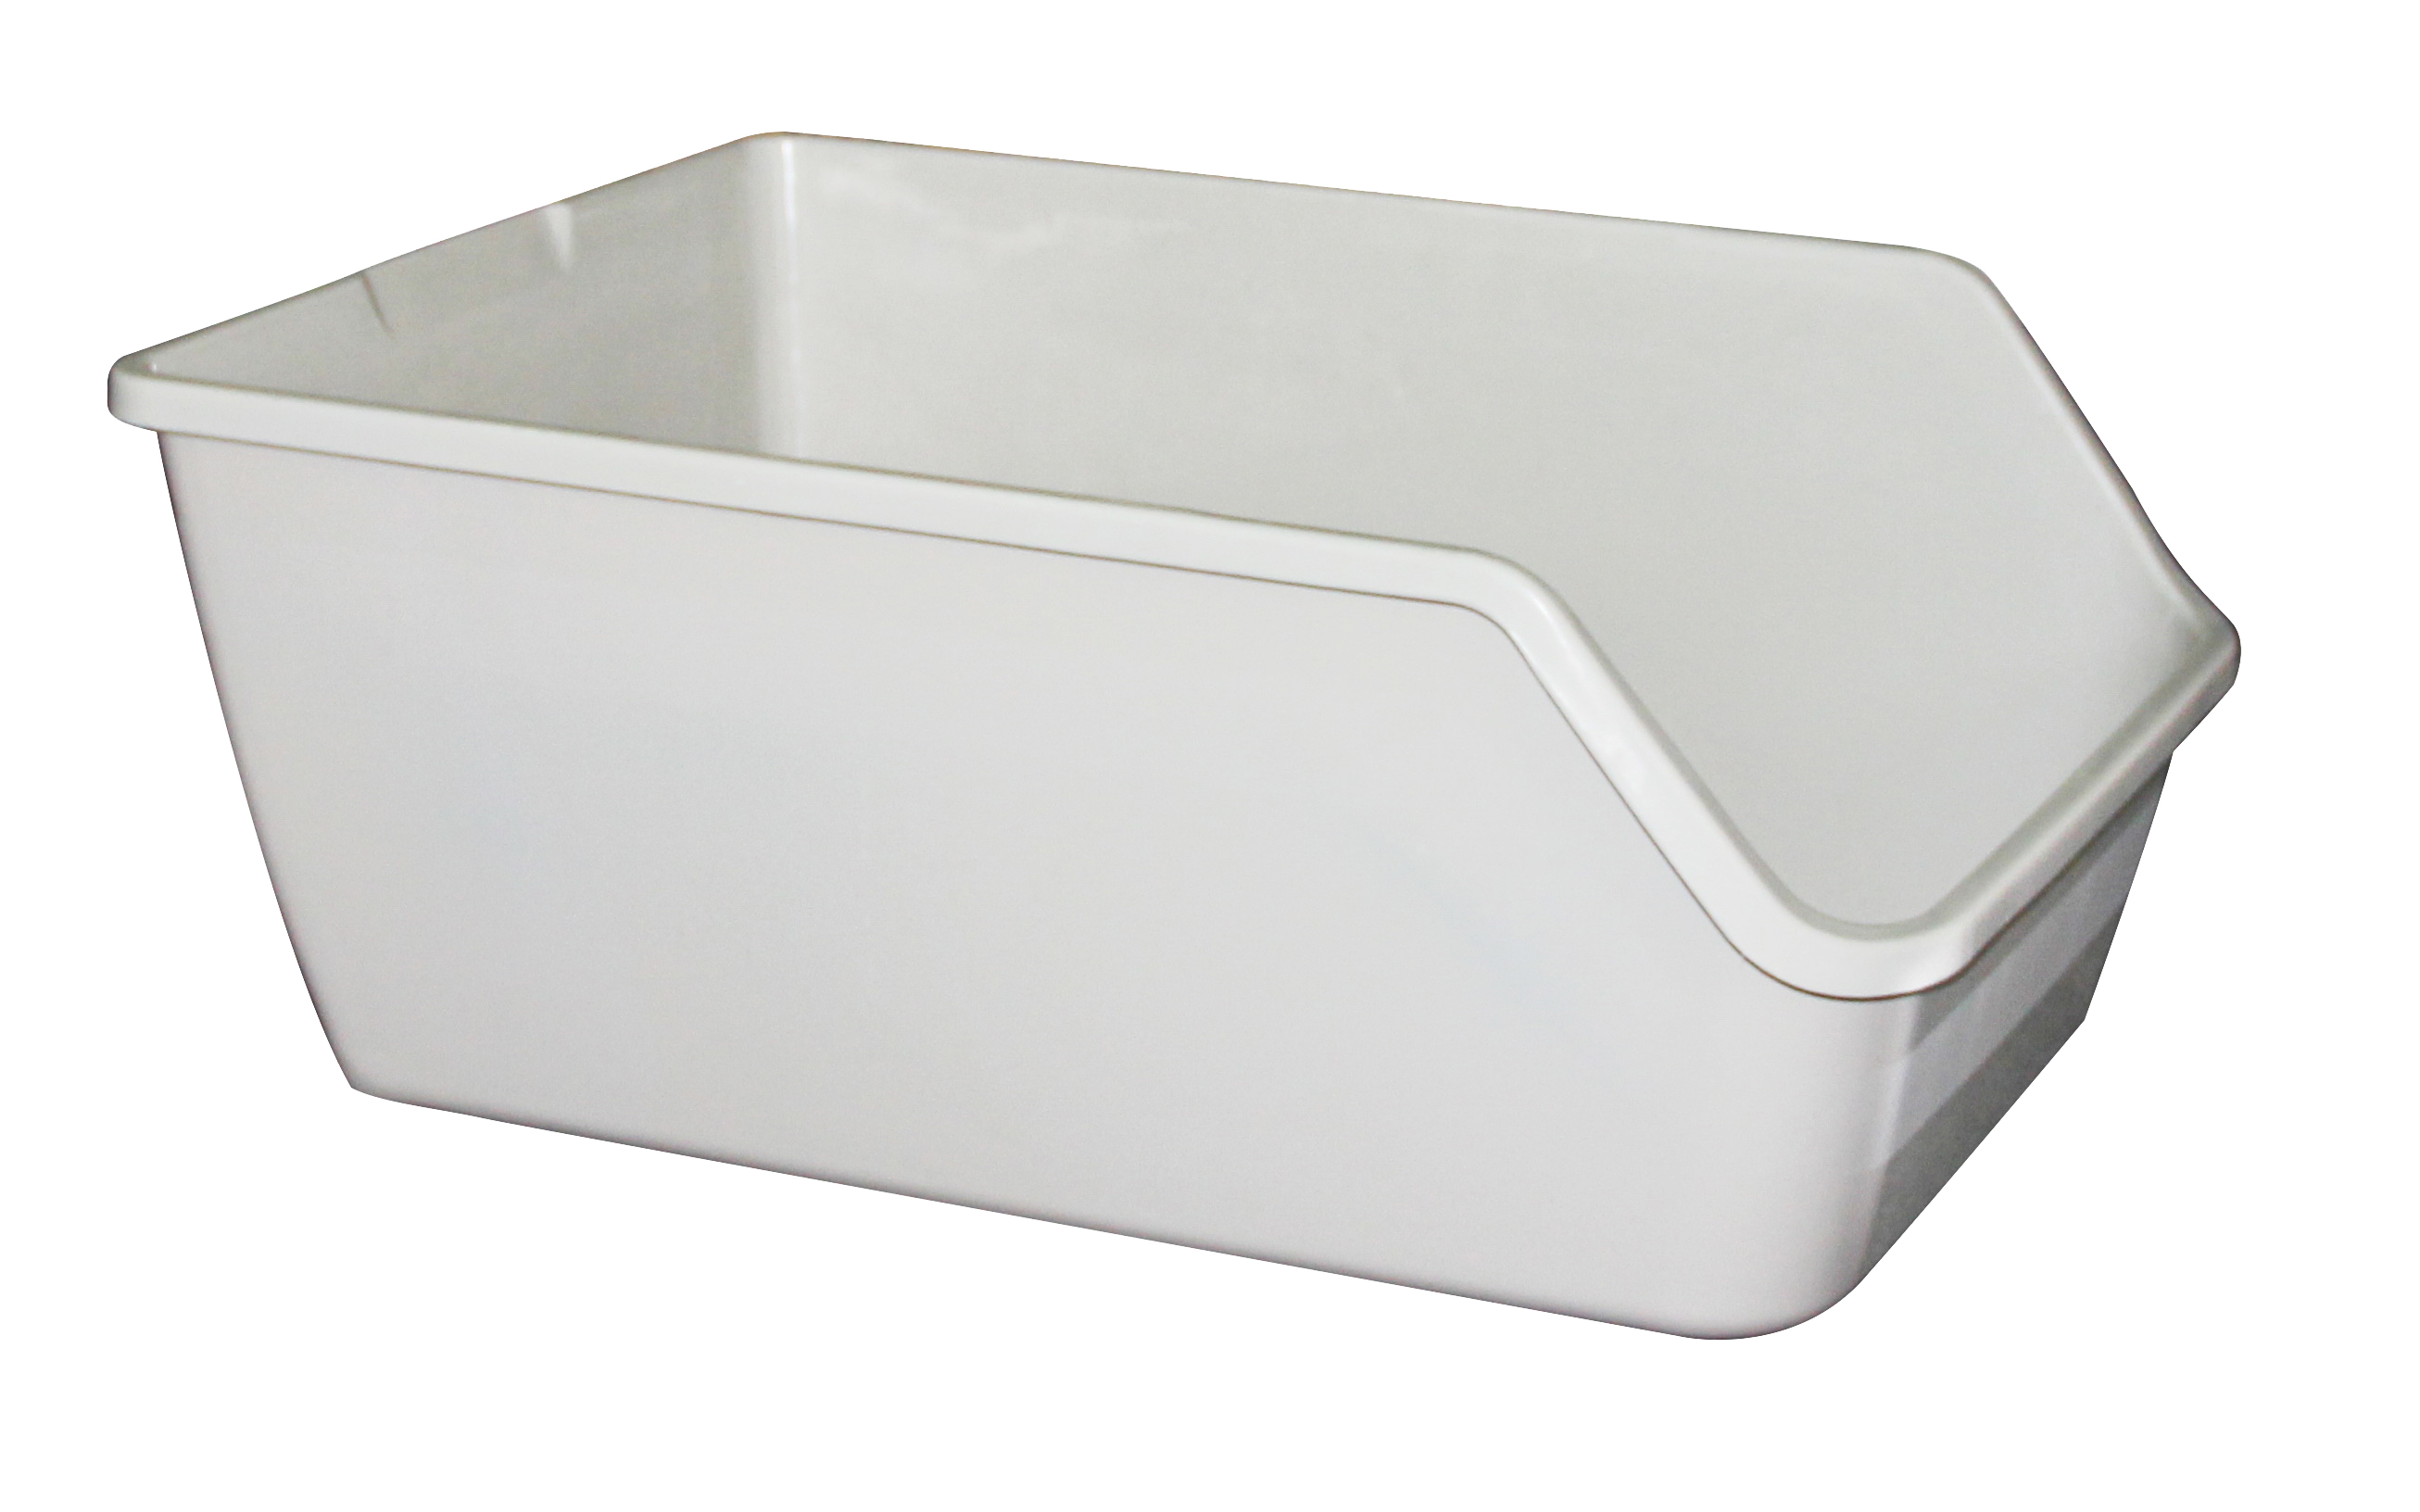 High-back Litter pan 61x45x25cm